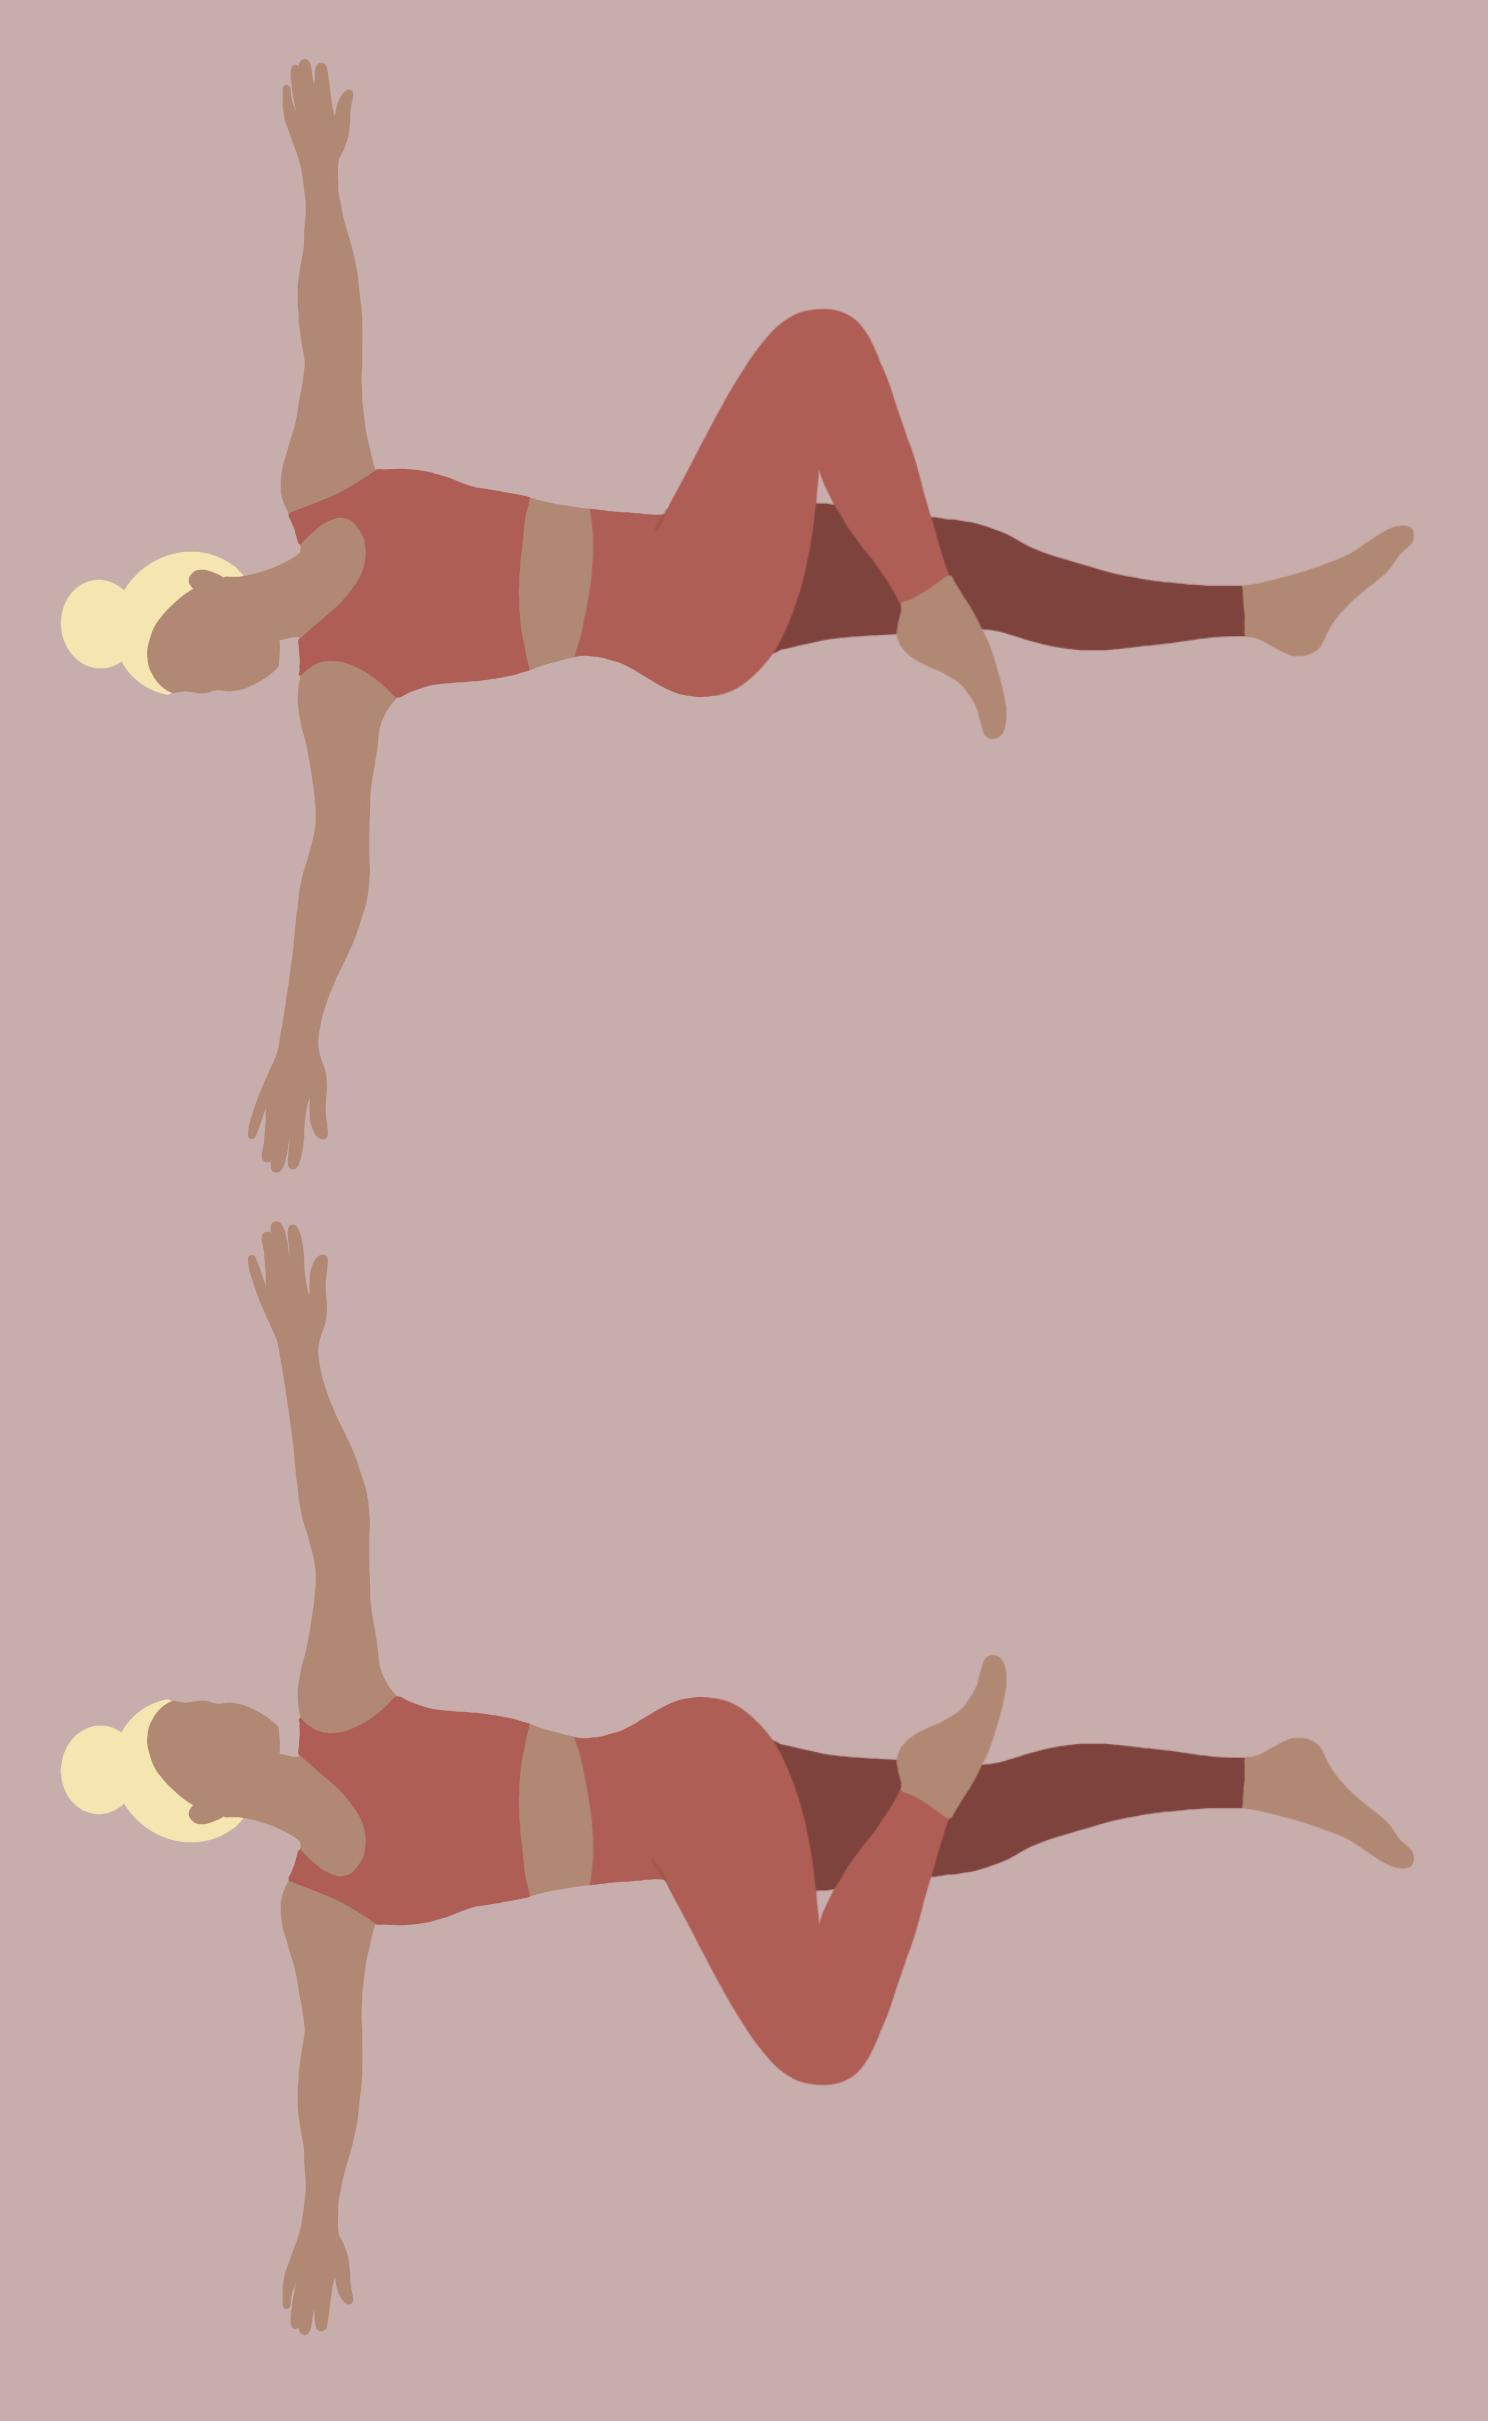 Illustration Yoga-Übung Krokodil